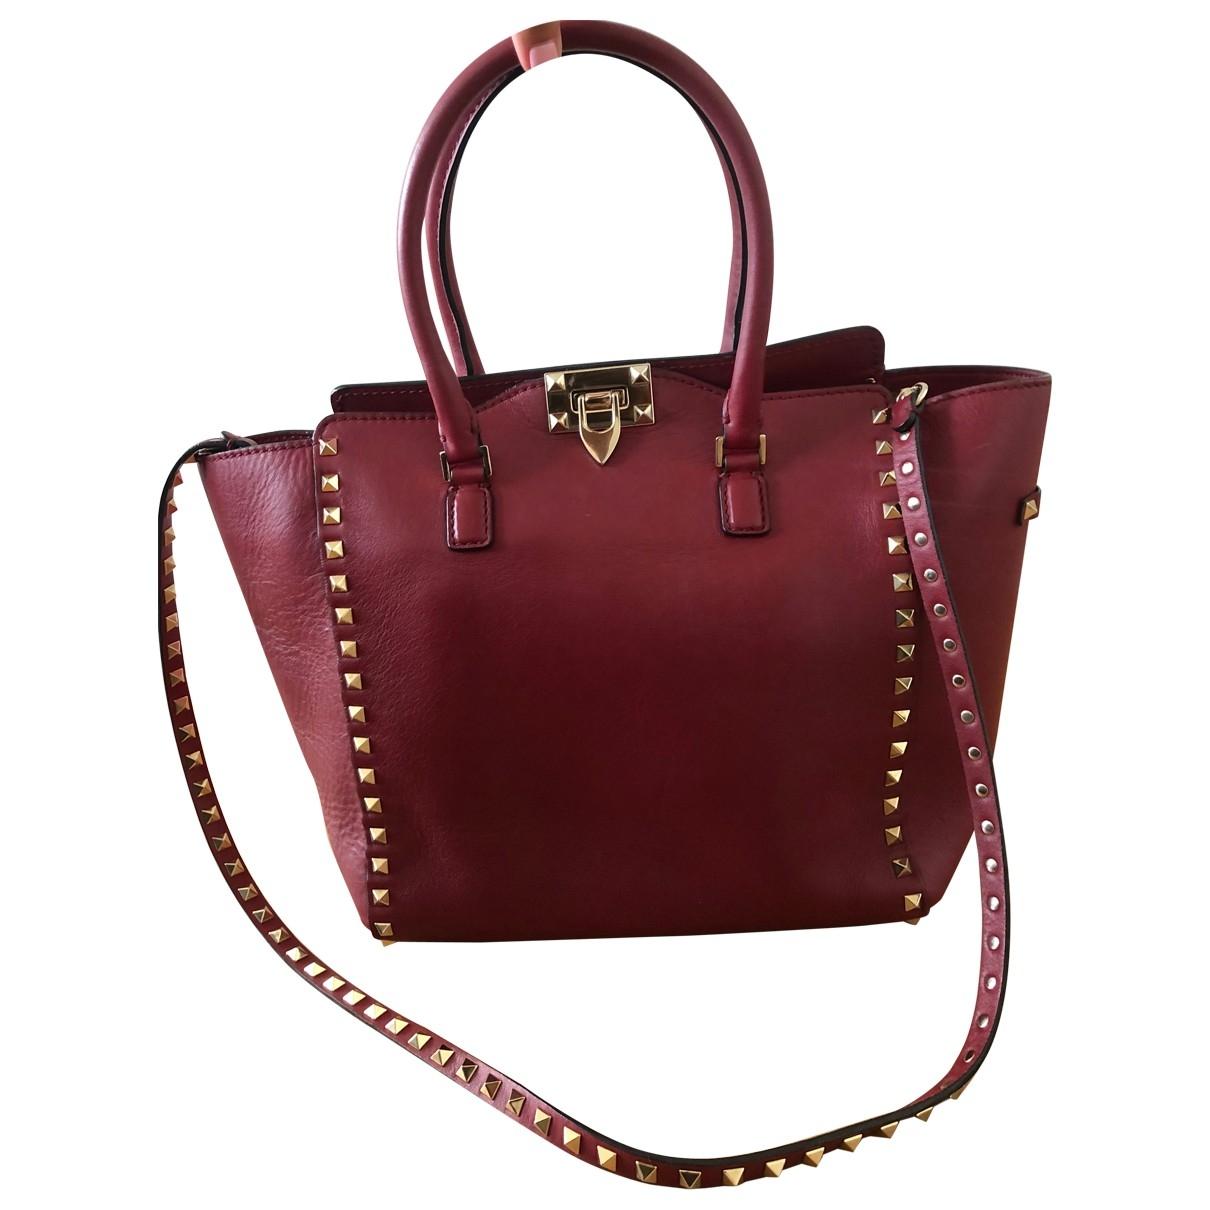 Valentino Garavani Rockstud Red Leather handbag for Women \N